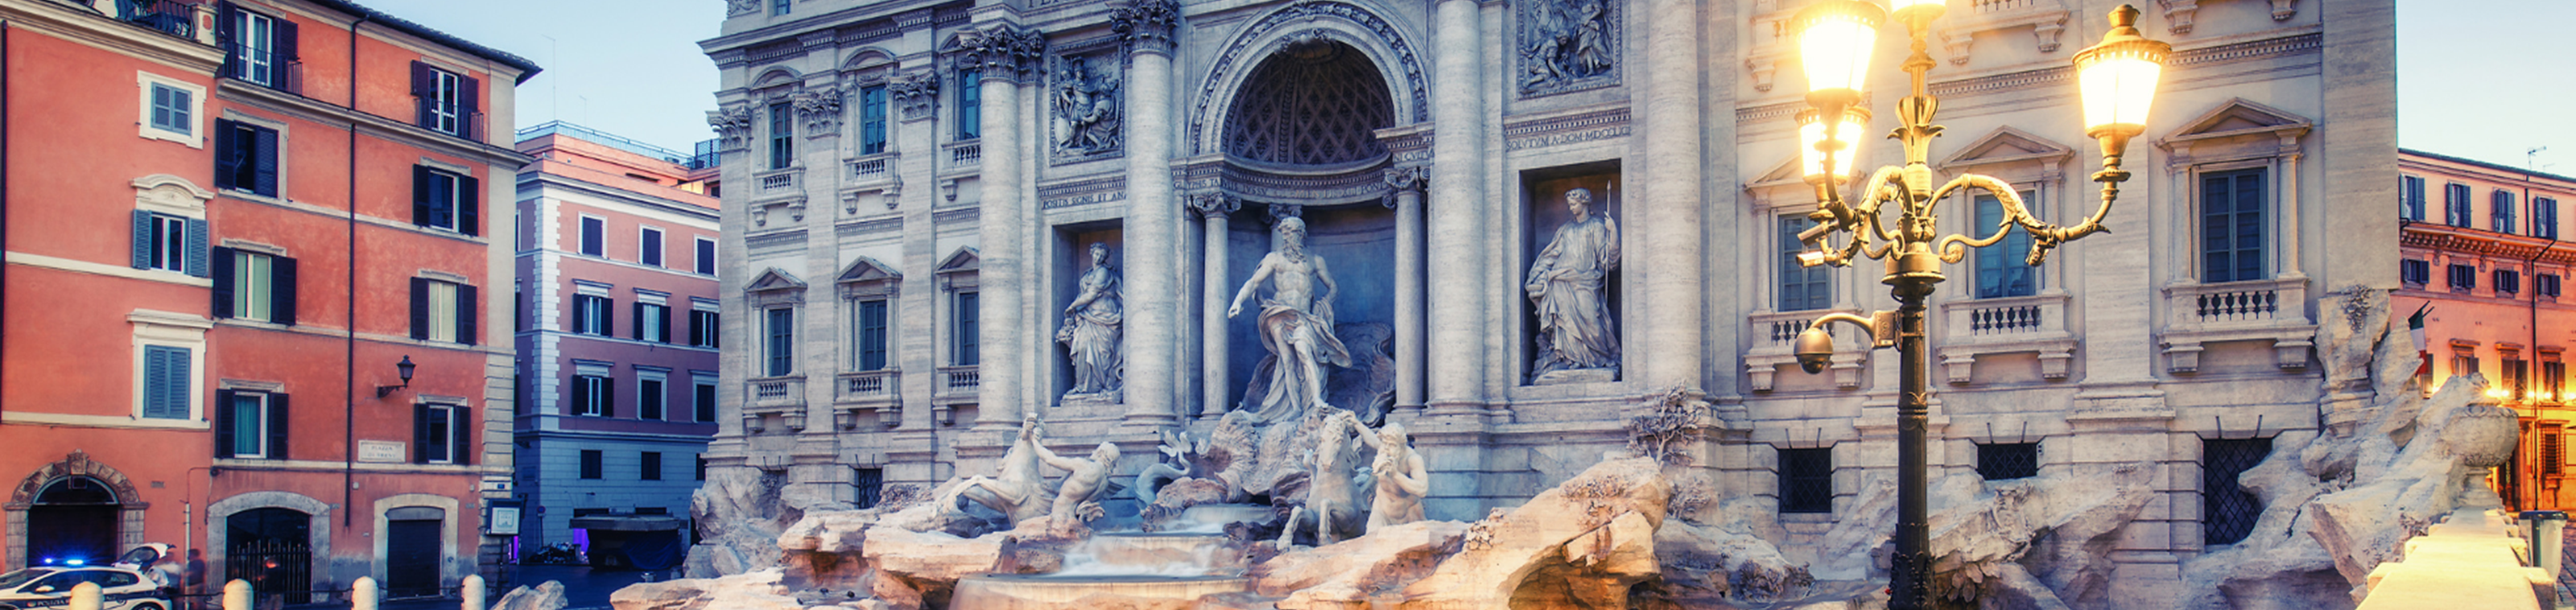 Perfecte uitvalsbasis voor je citytrip in Rome: Hotel Trevi***